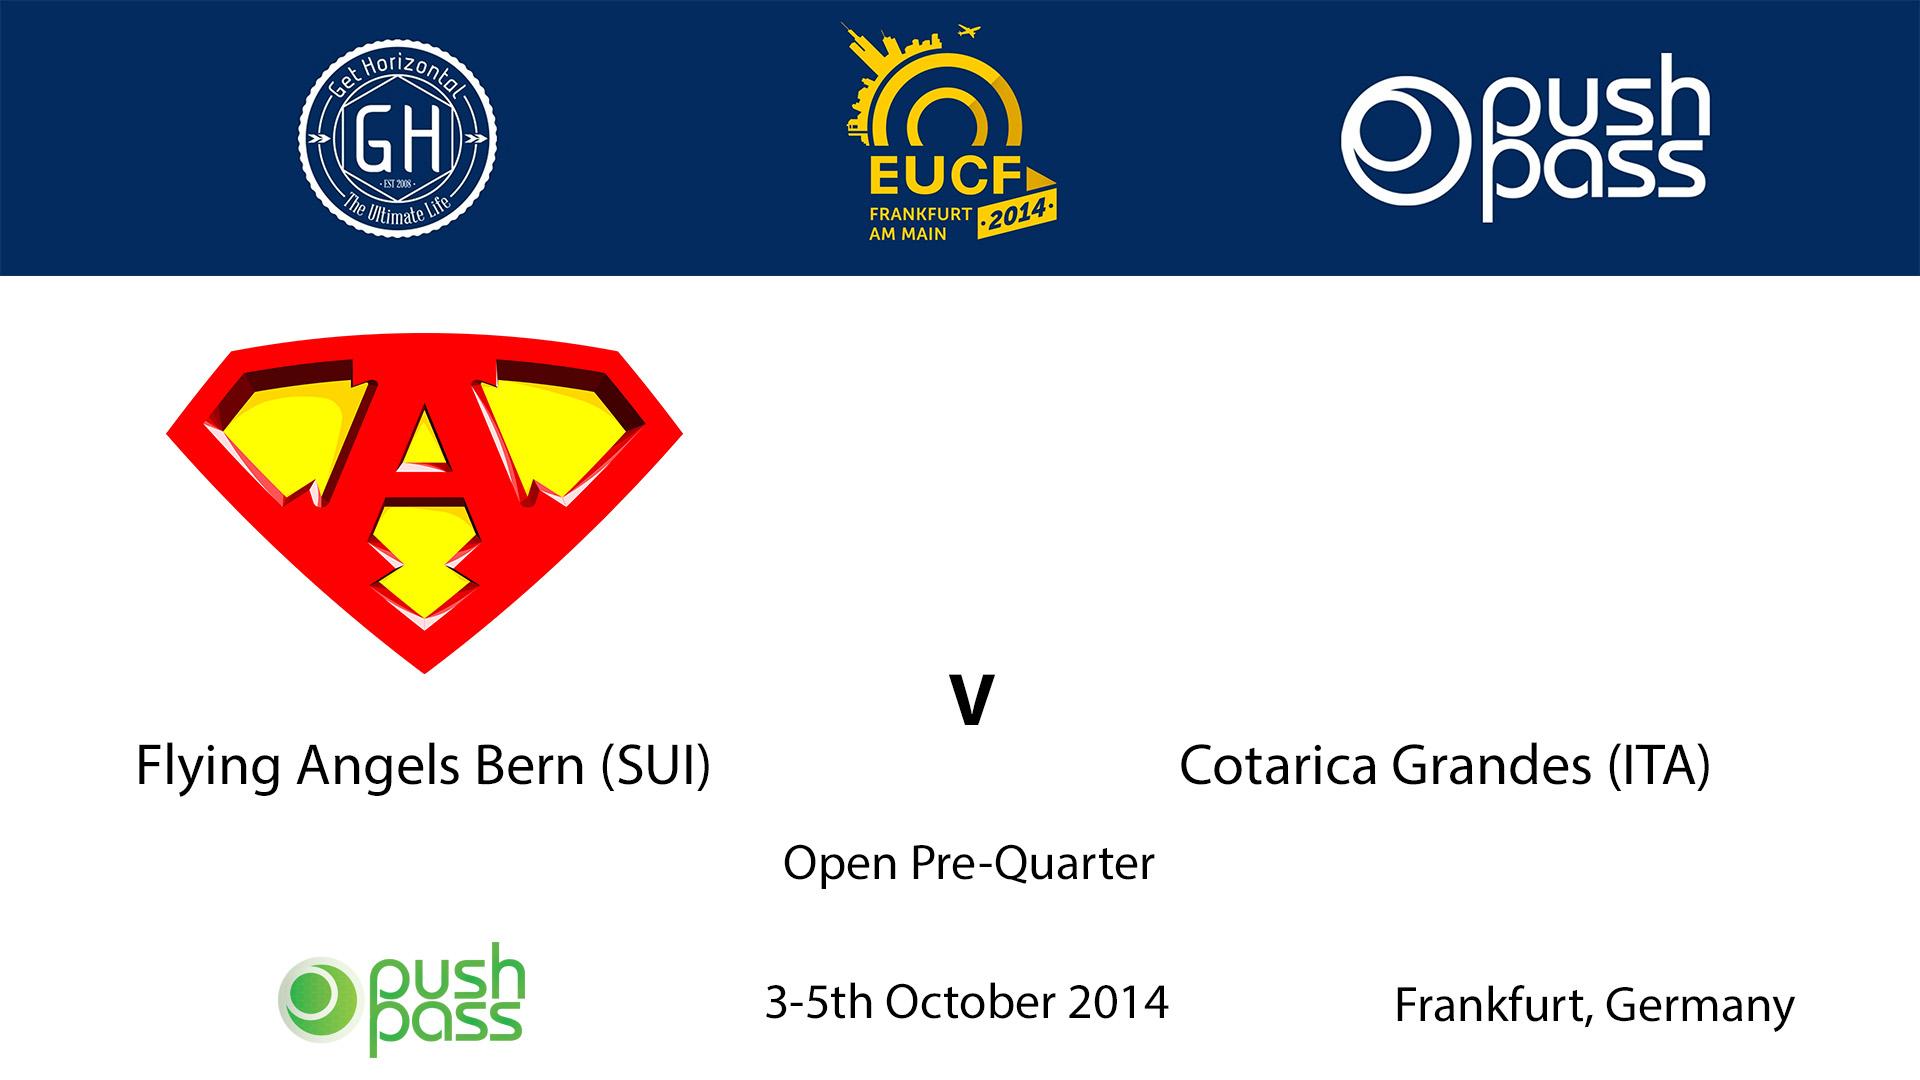 EUCF 2014: Open Pre-Quarter - FAB (5) v Cotarica Grandes (12)